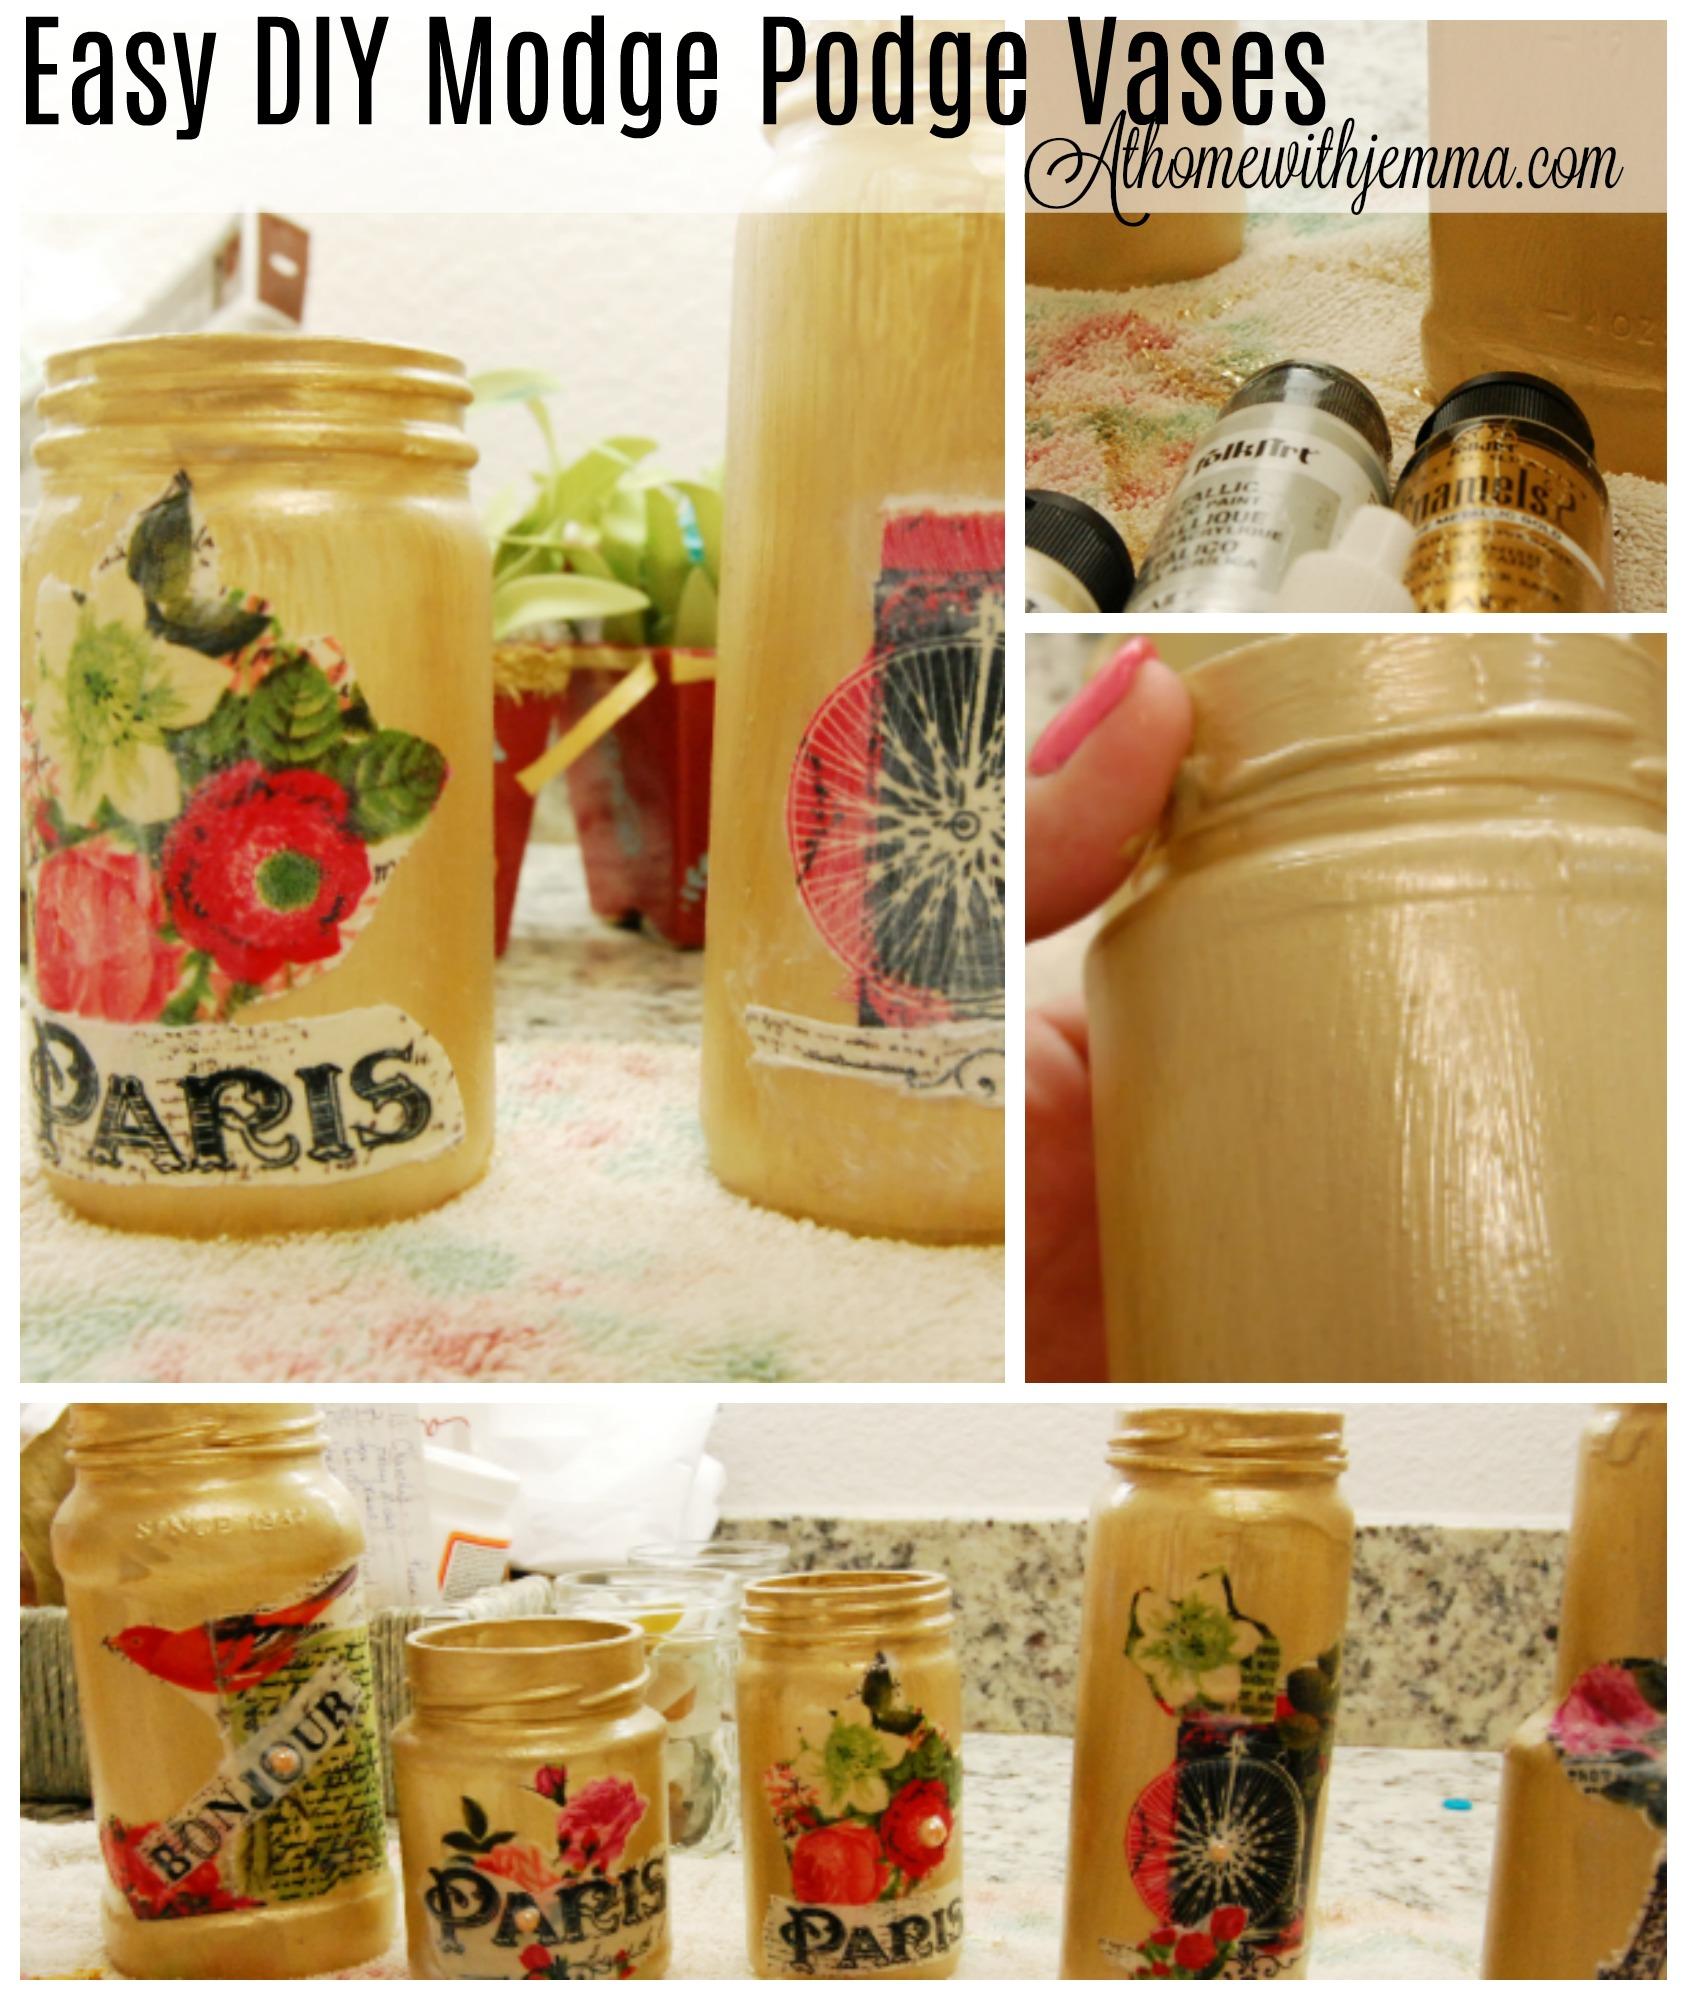 jars-vases-craft-diy-modge-podge-athomewithjemma